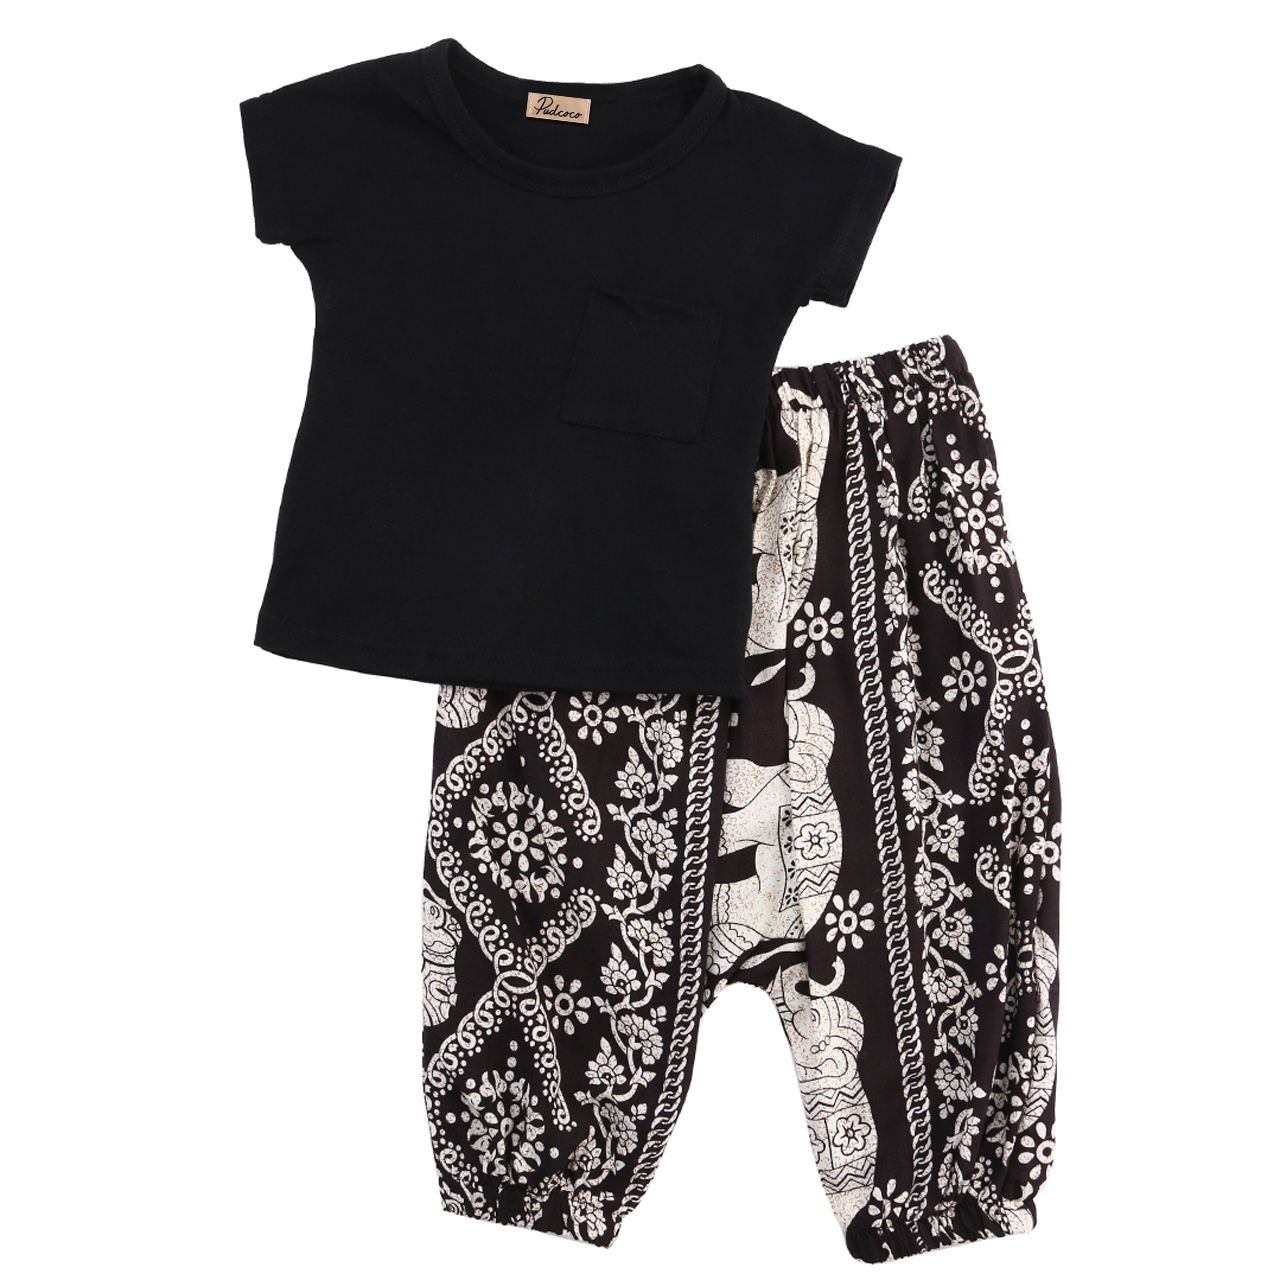 6d9776bff5876 Nº Online Wholesale free shipping stylish kids toddler girls ...